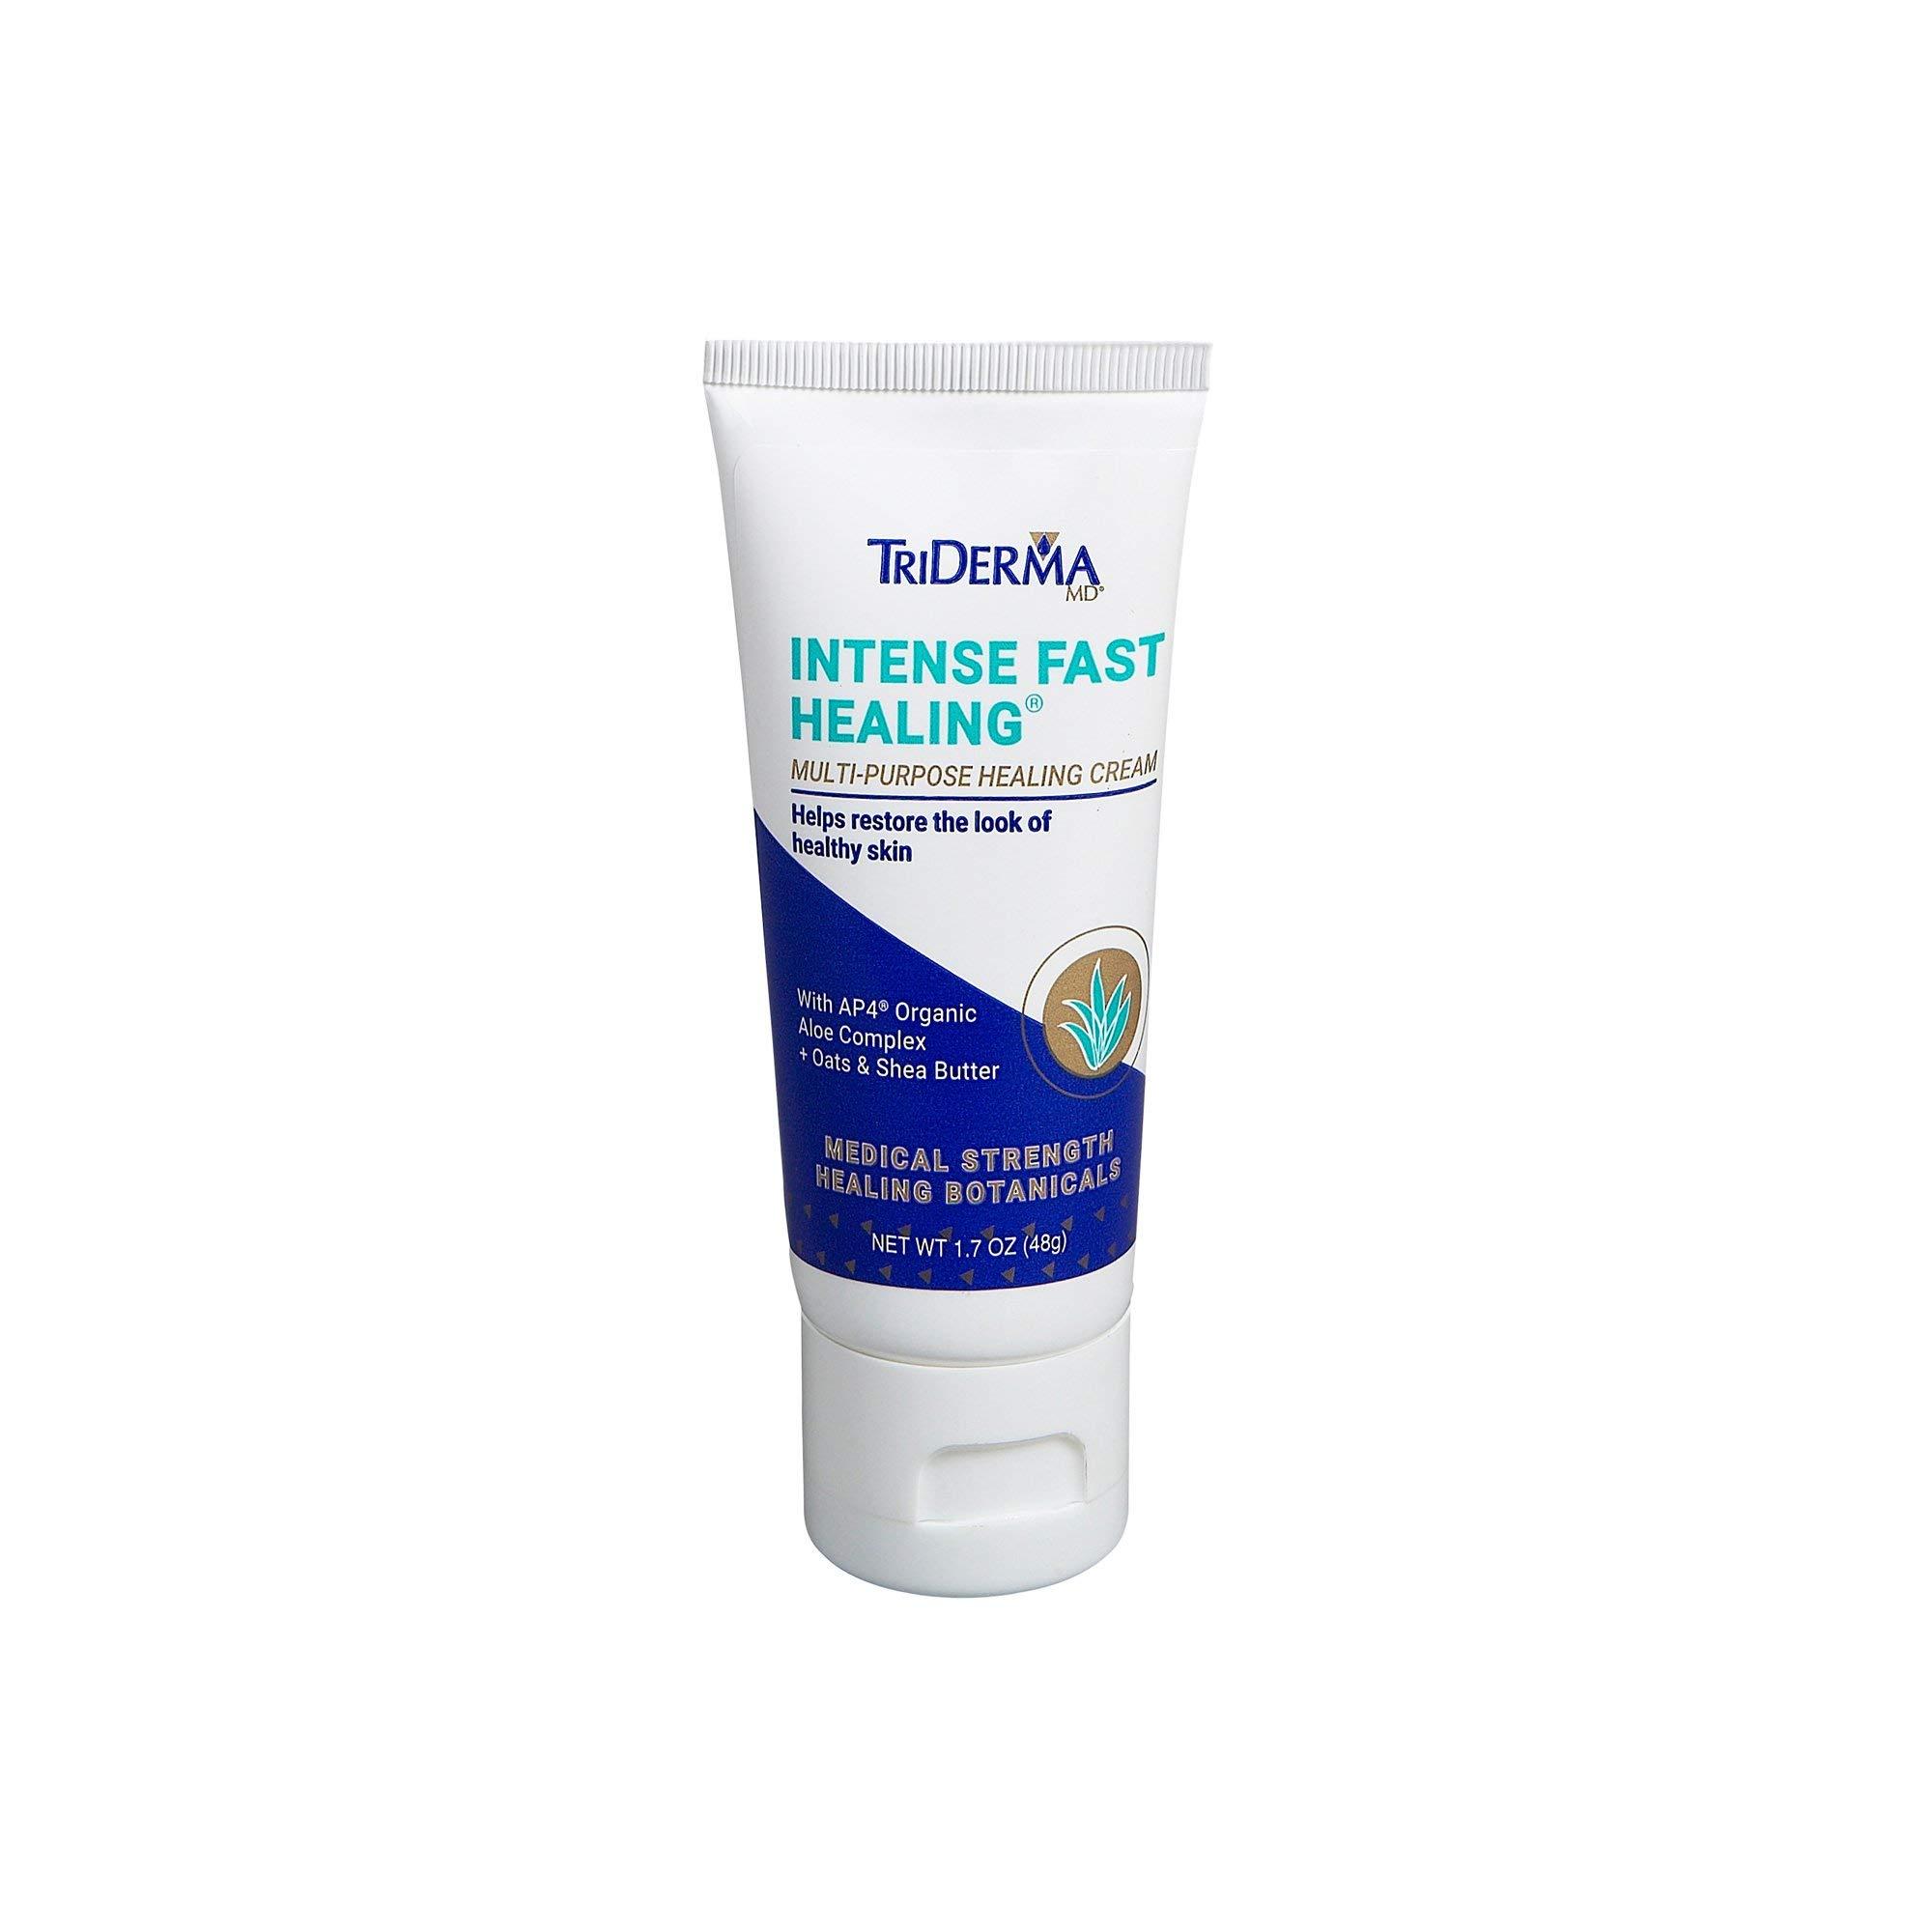 TriDerma Intense Fast Healing Multi-Purpose Cream (1.7 oz)